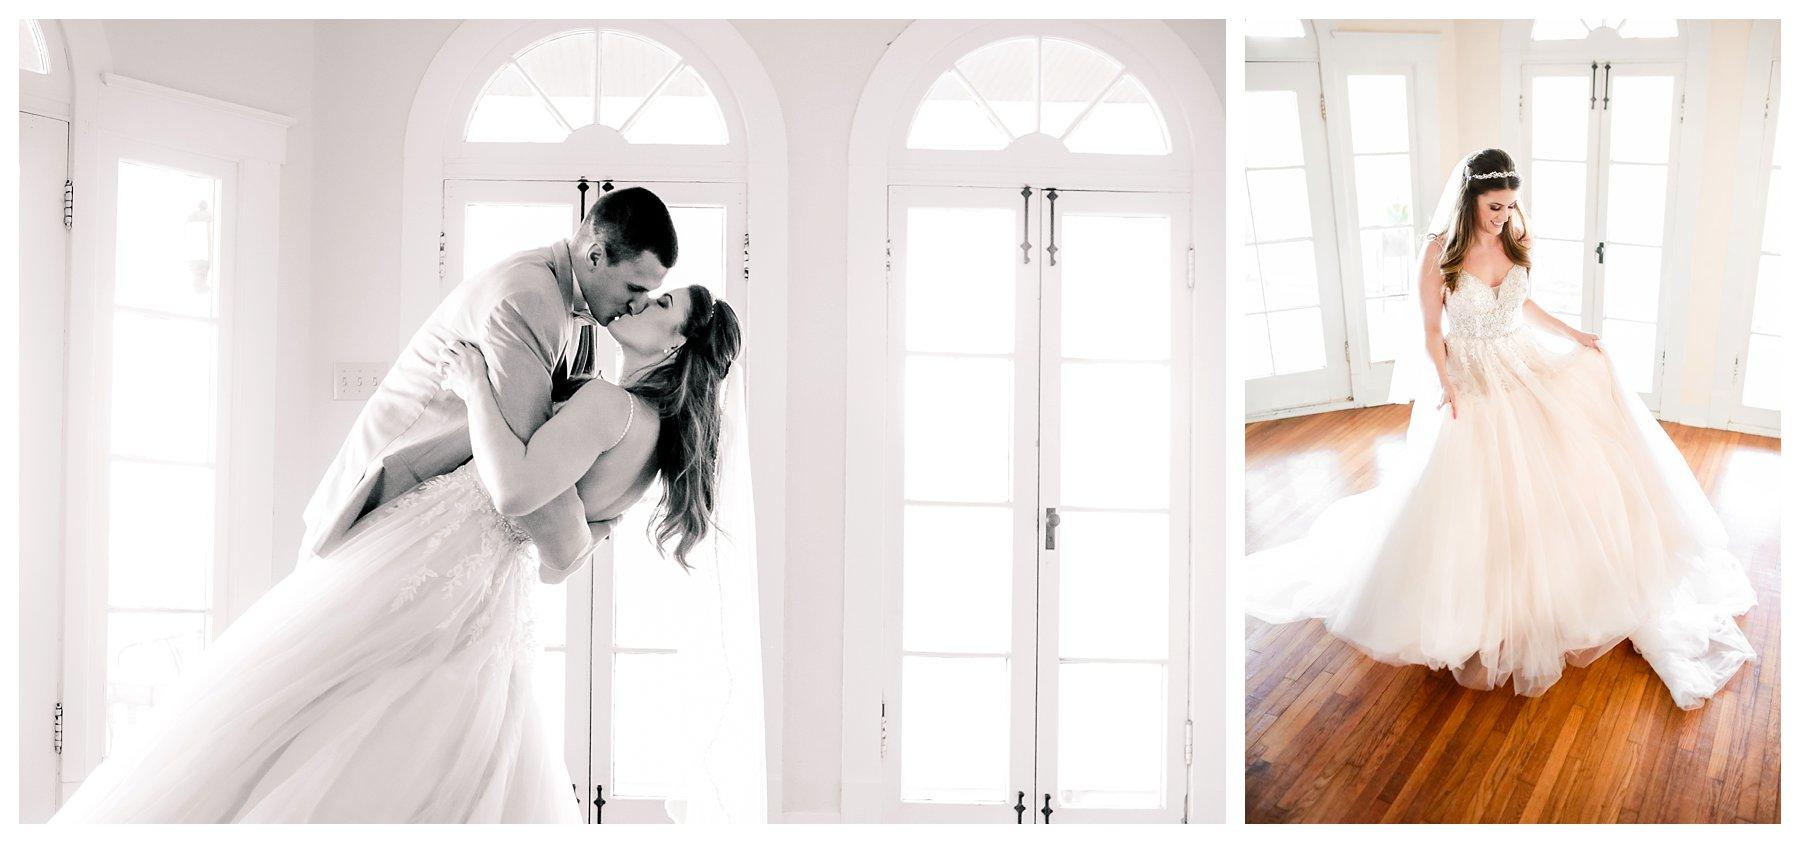 photographer_wedding_saint_louis_Kansas_City_Photography_Videography_workshop_training_styled_engagement_Lake_Ozark_KC_MO_STL_Rolla_Hermann_Saint_James_0372.jpg